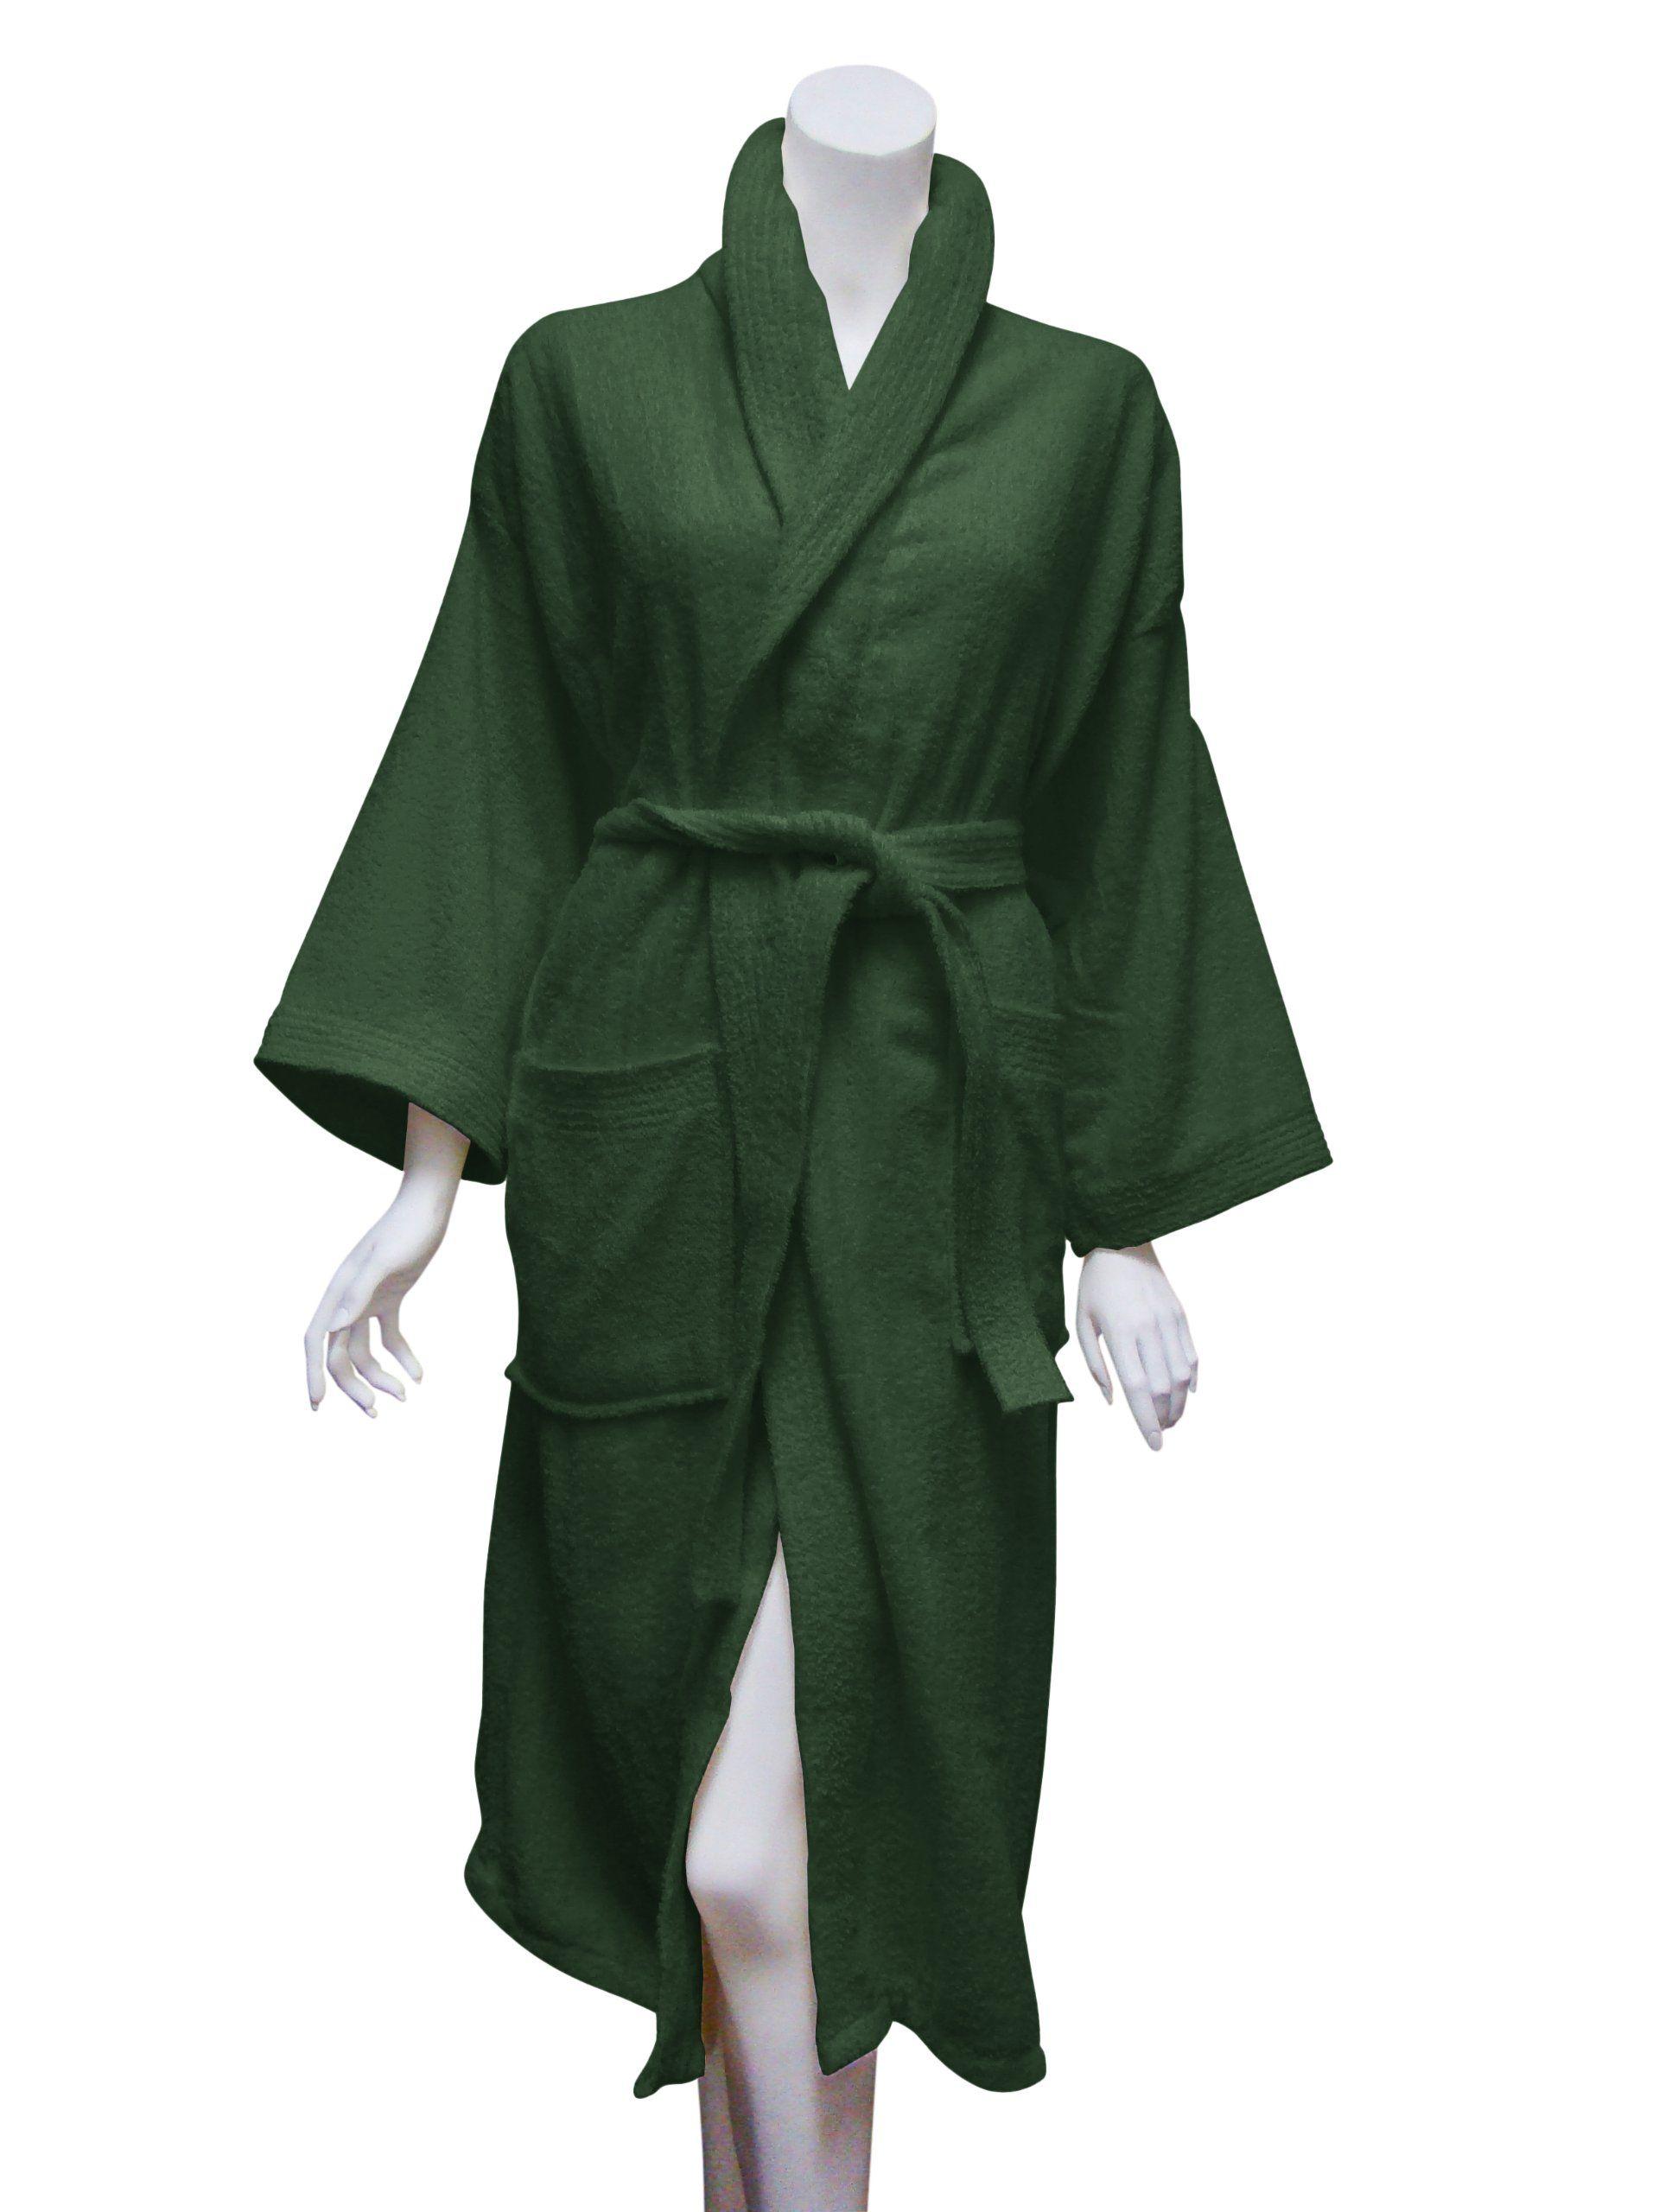 b4263d1643 Maude robe -100-Percent Cotton Terry Adult Robe